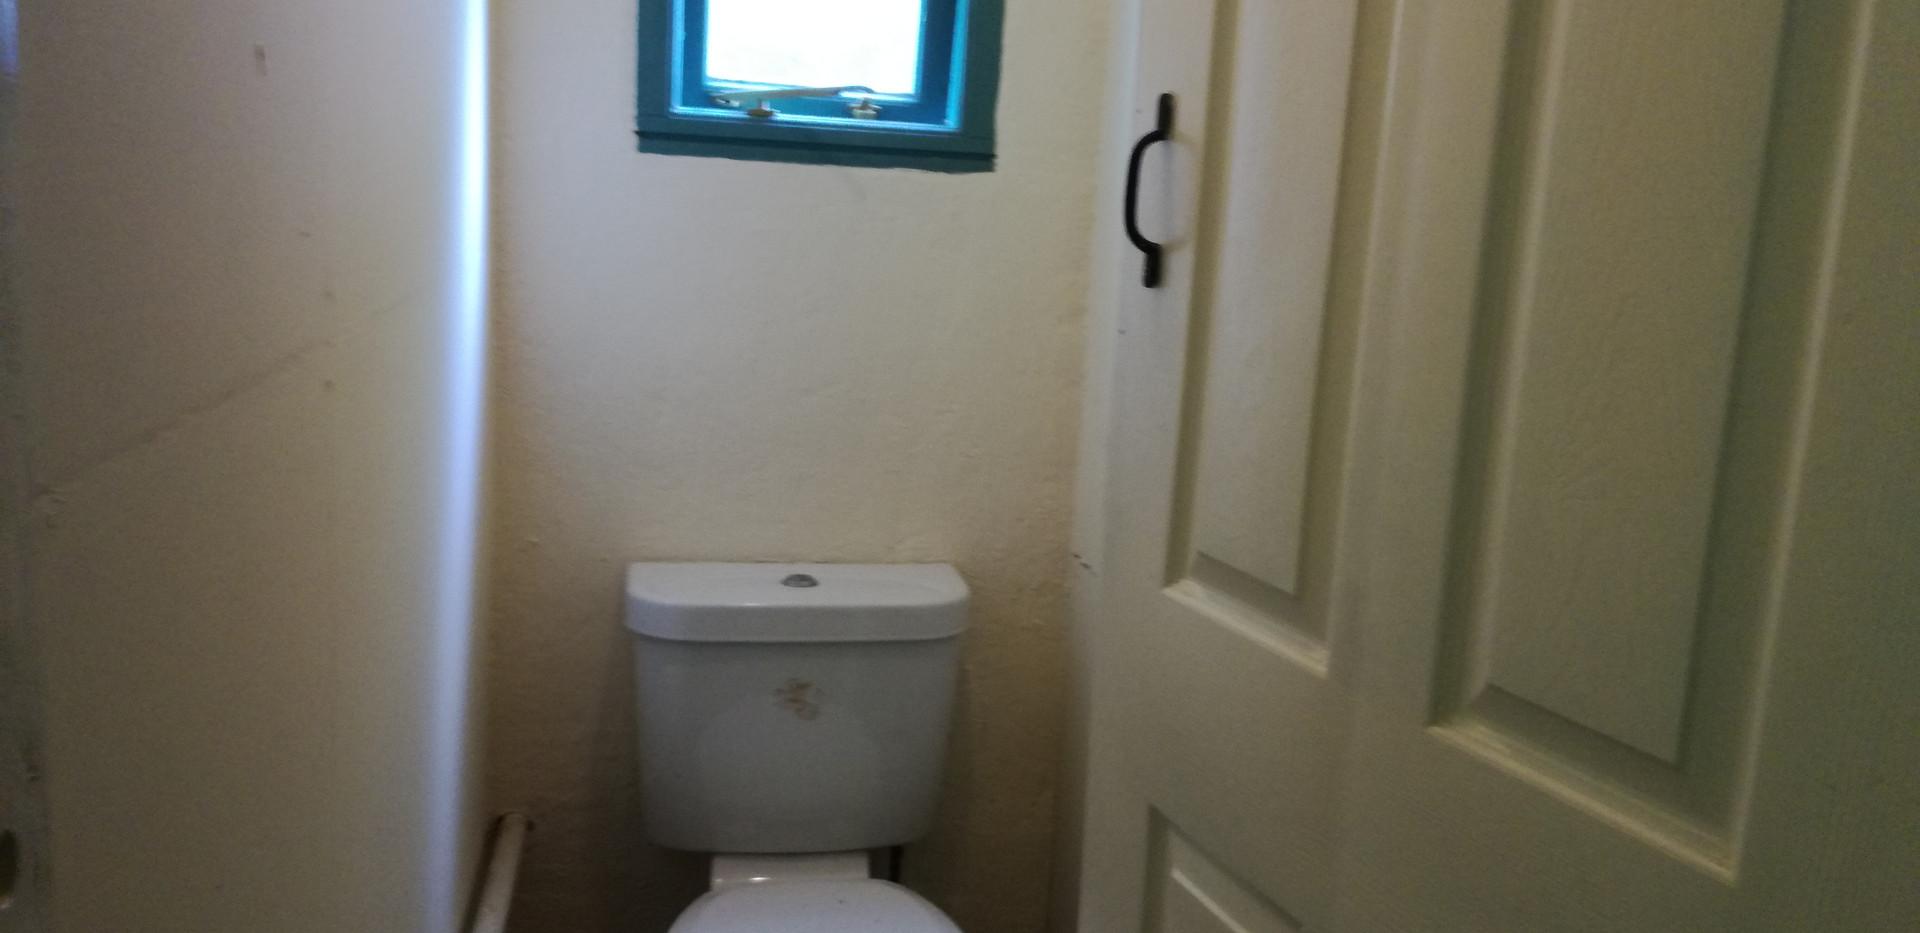 Utility room toilet